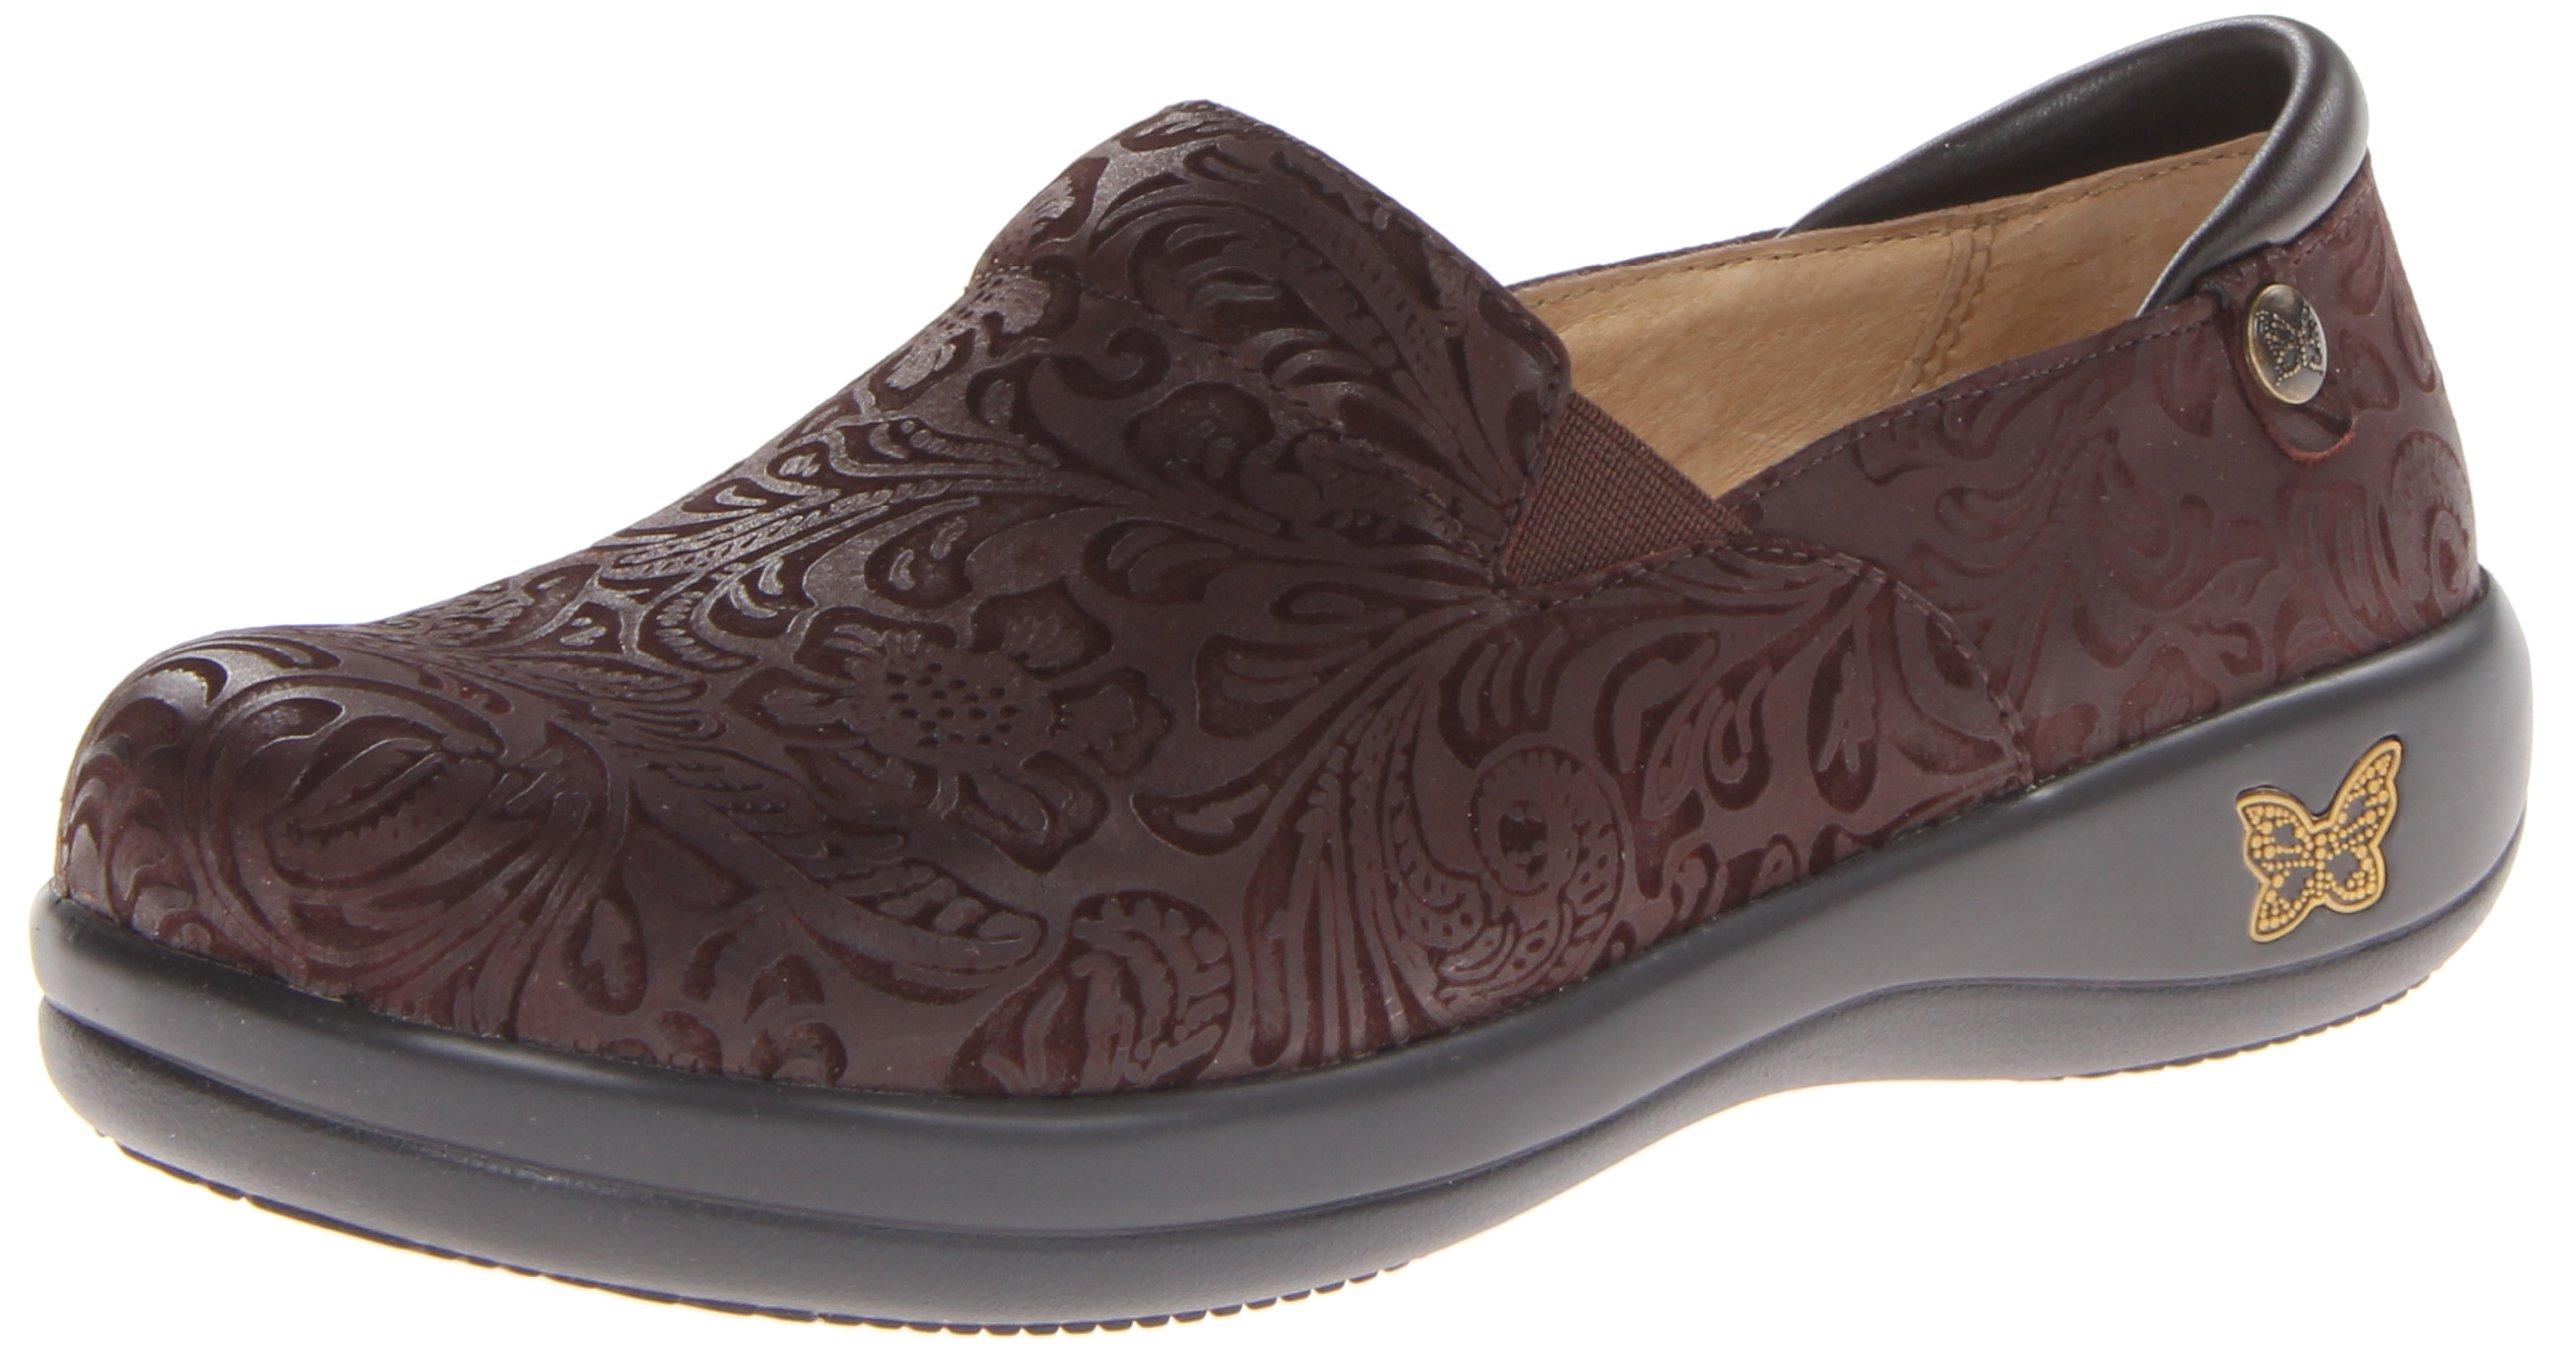 Alegria Women's Keli Professional Slip Resistant Work Shoe,Choco Embossed Paisley,39 BR/9-9.5 M US